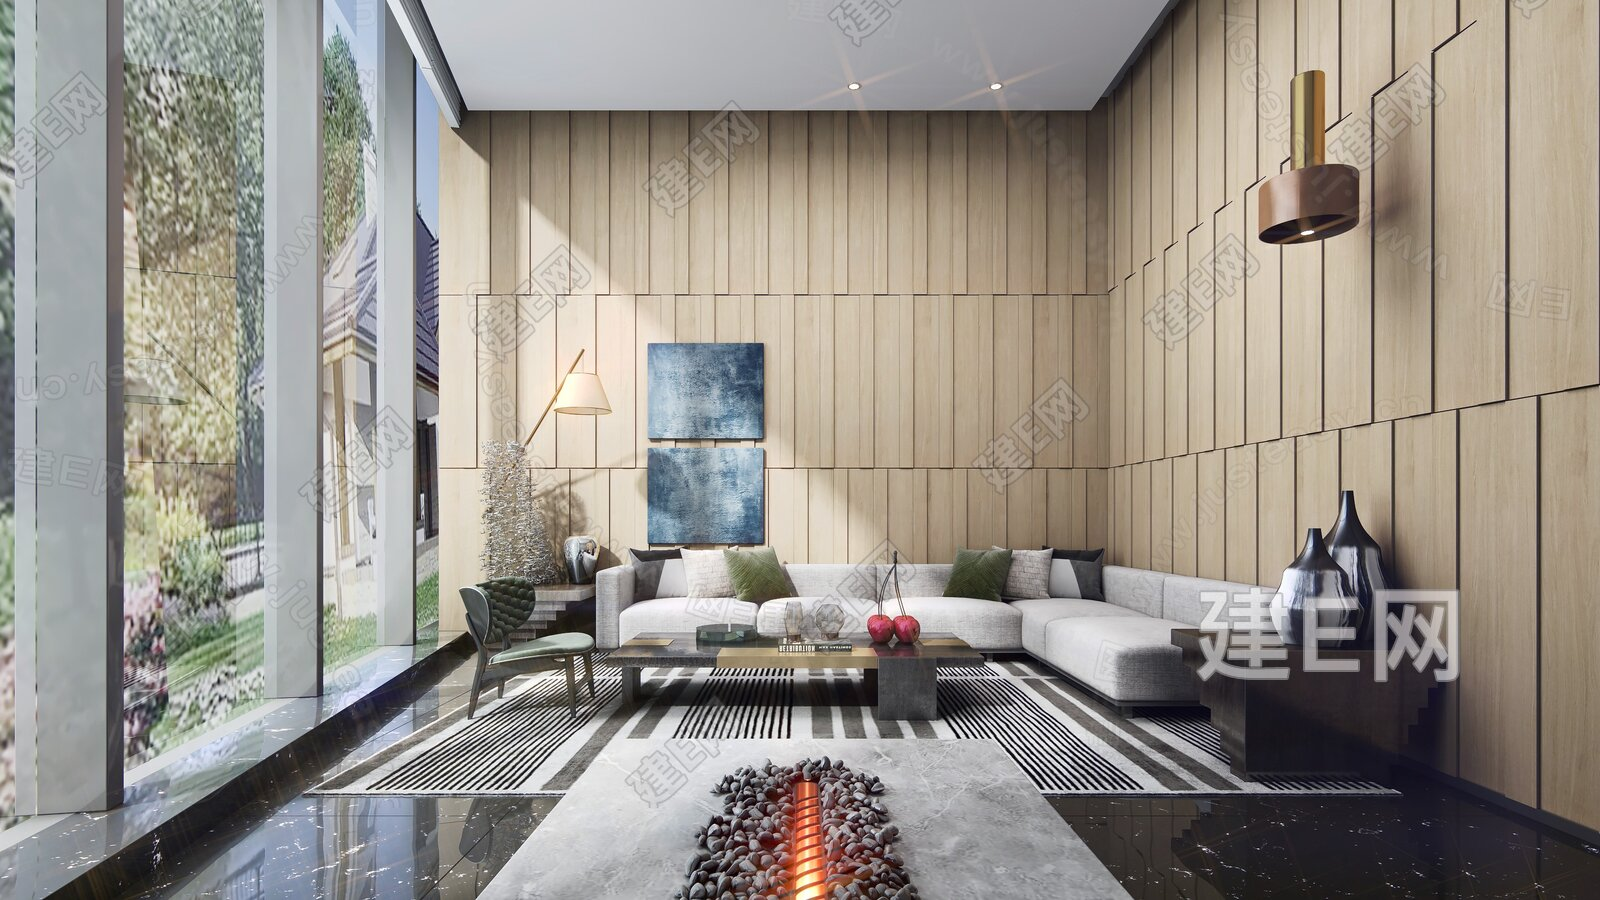 LSDCASA 葛亚曦 现代售楼处休息区3d模型